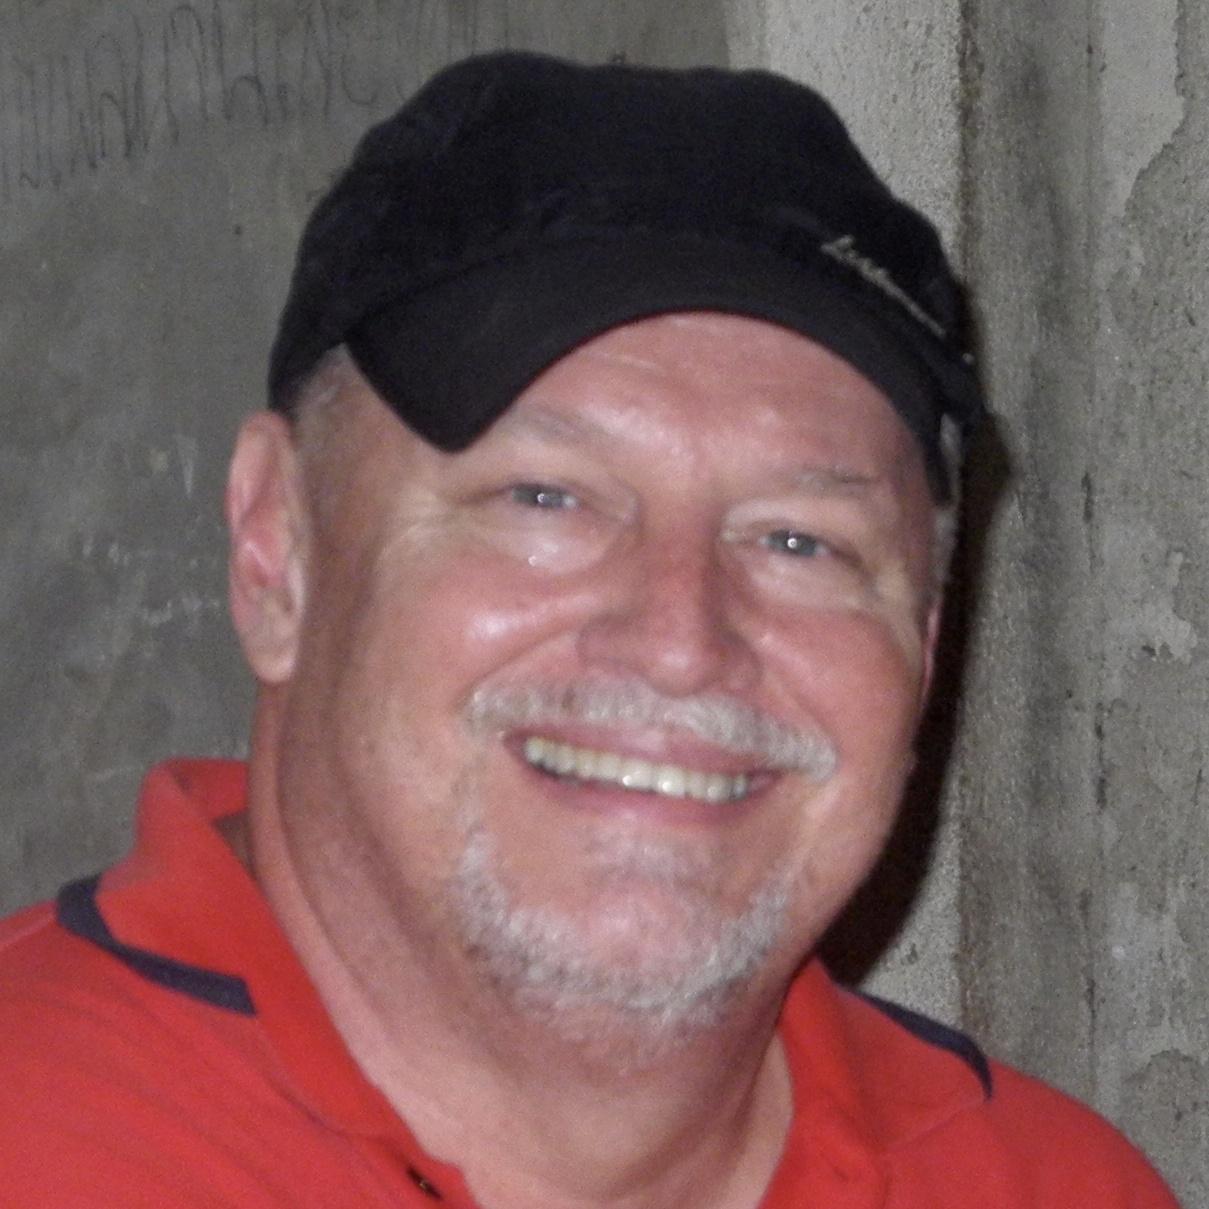 Thomas W. Silkwood